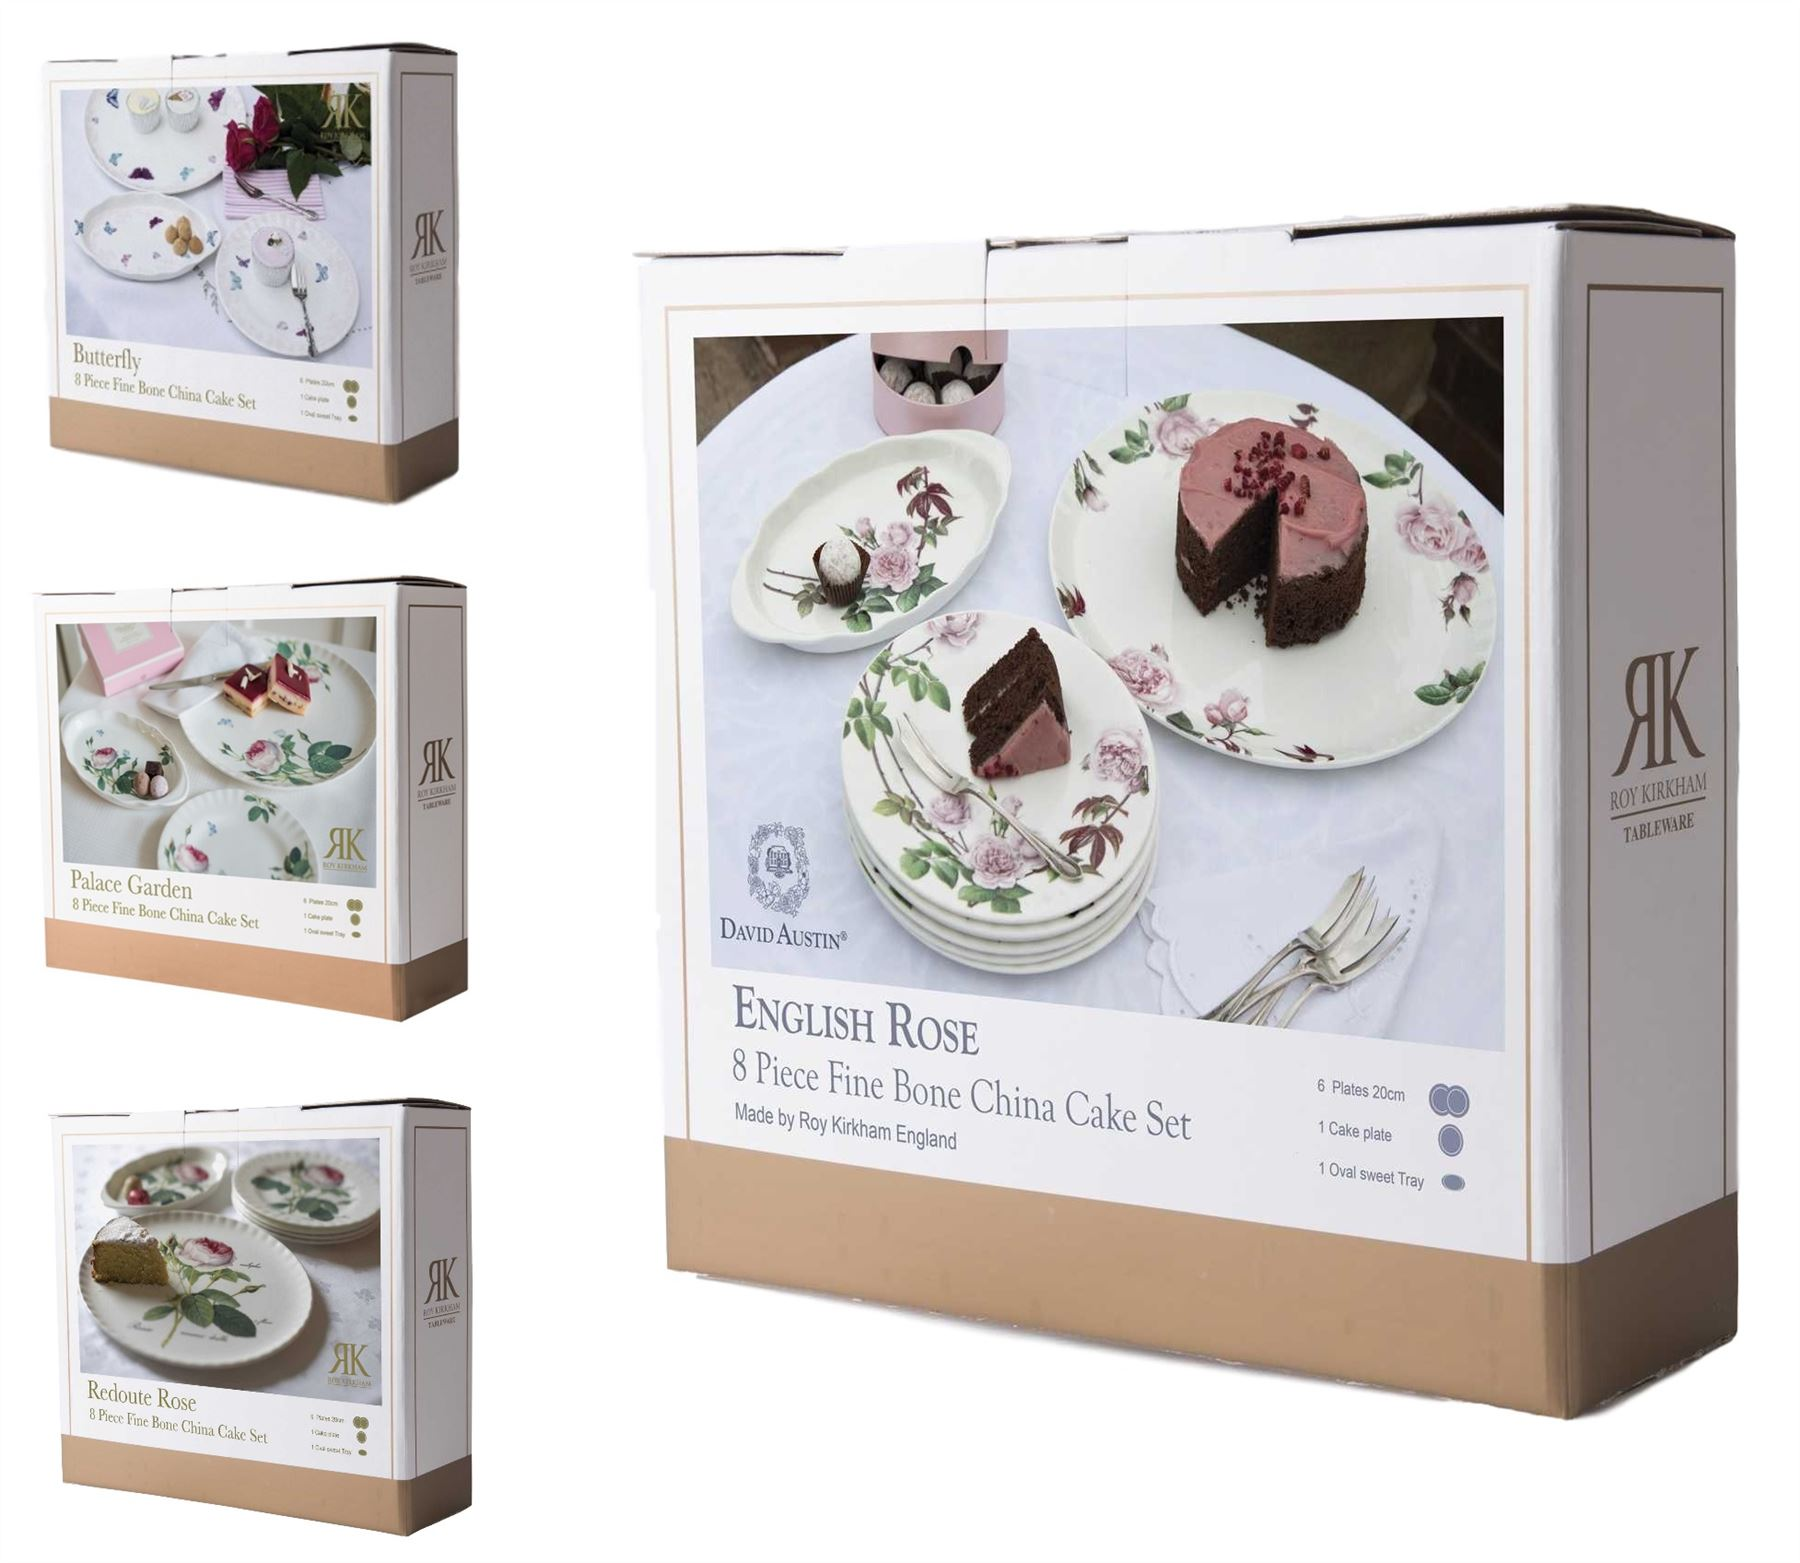 Roy Kirkham feinstes Porzellan Kuchen Portion Geschirr Sets in | eBay